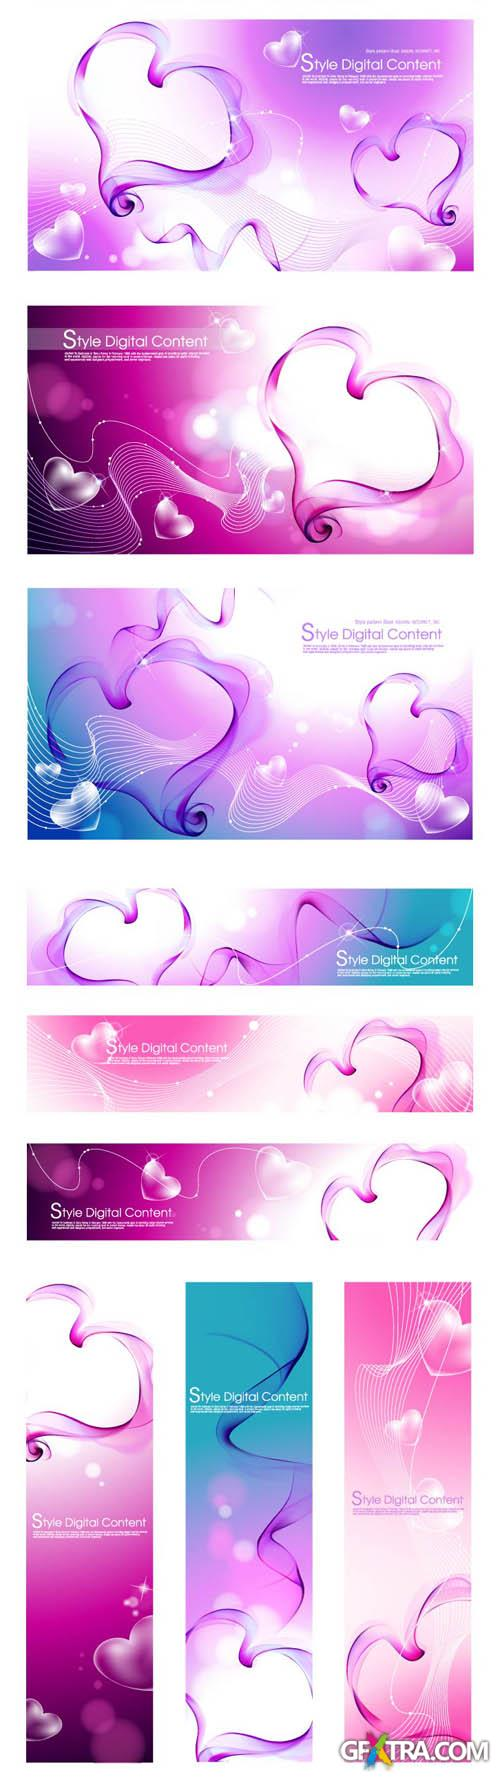 Romantic Vector Digital Backgrounds